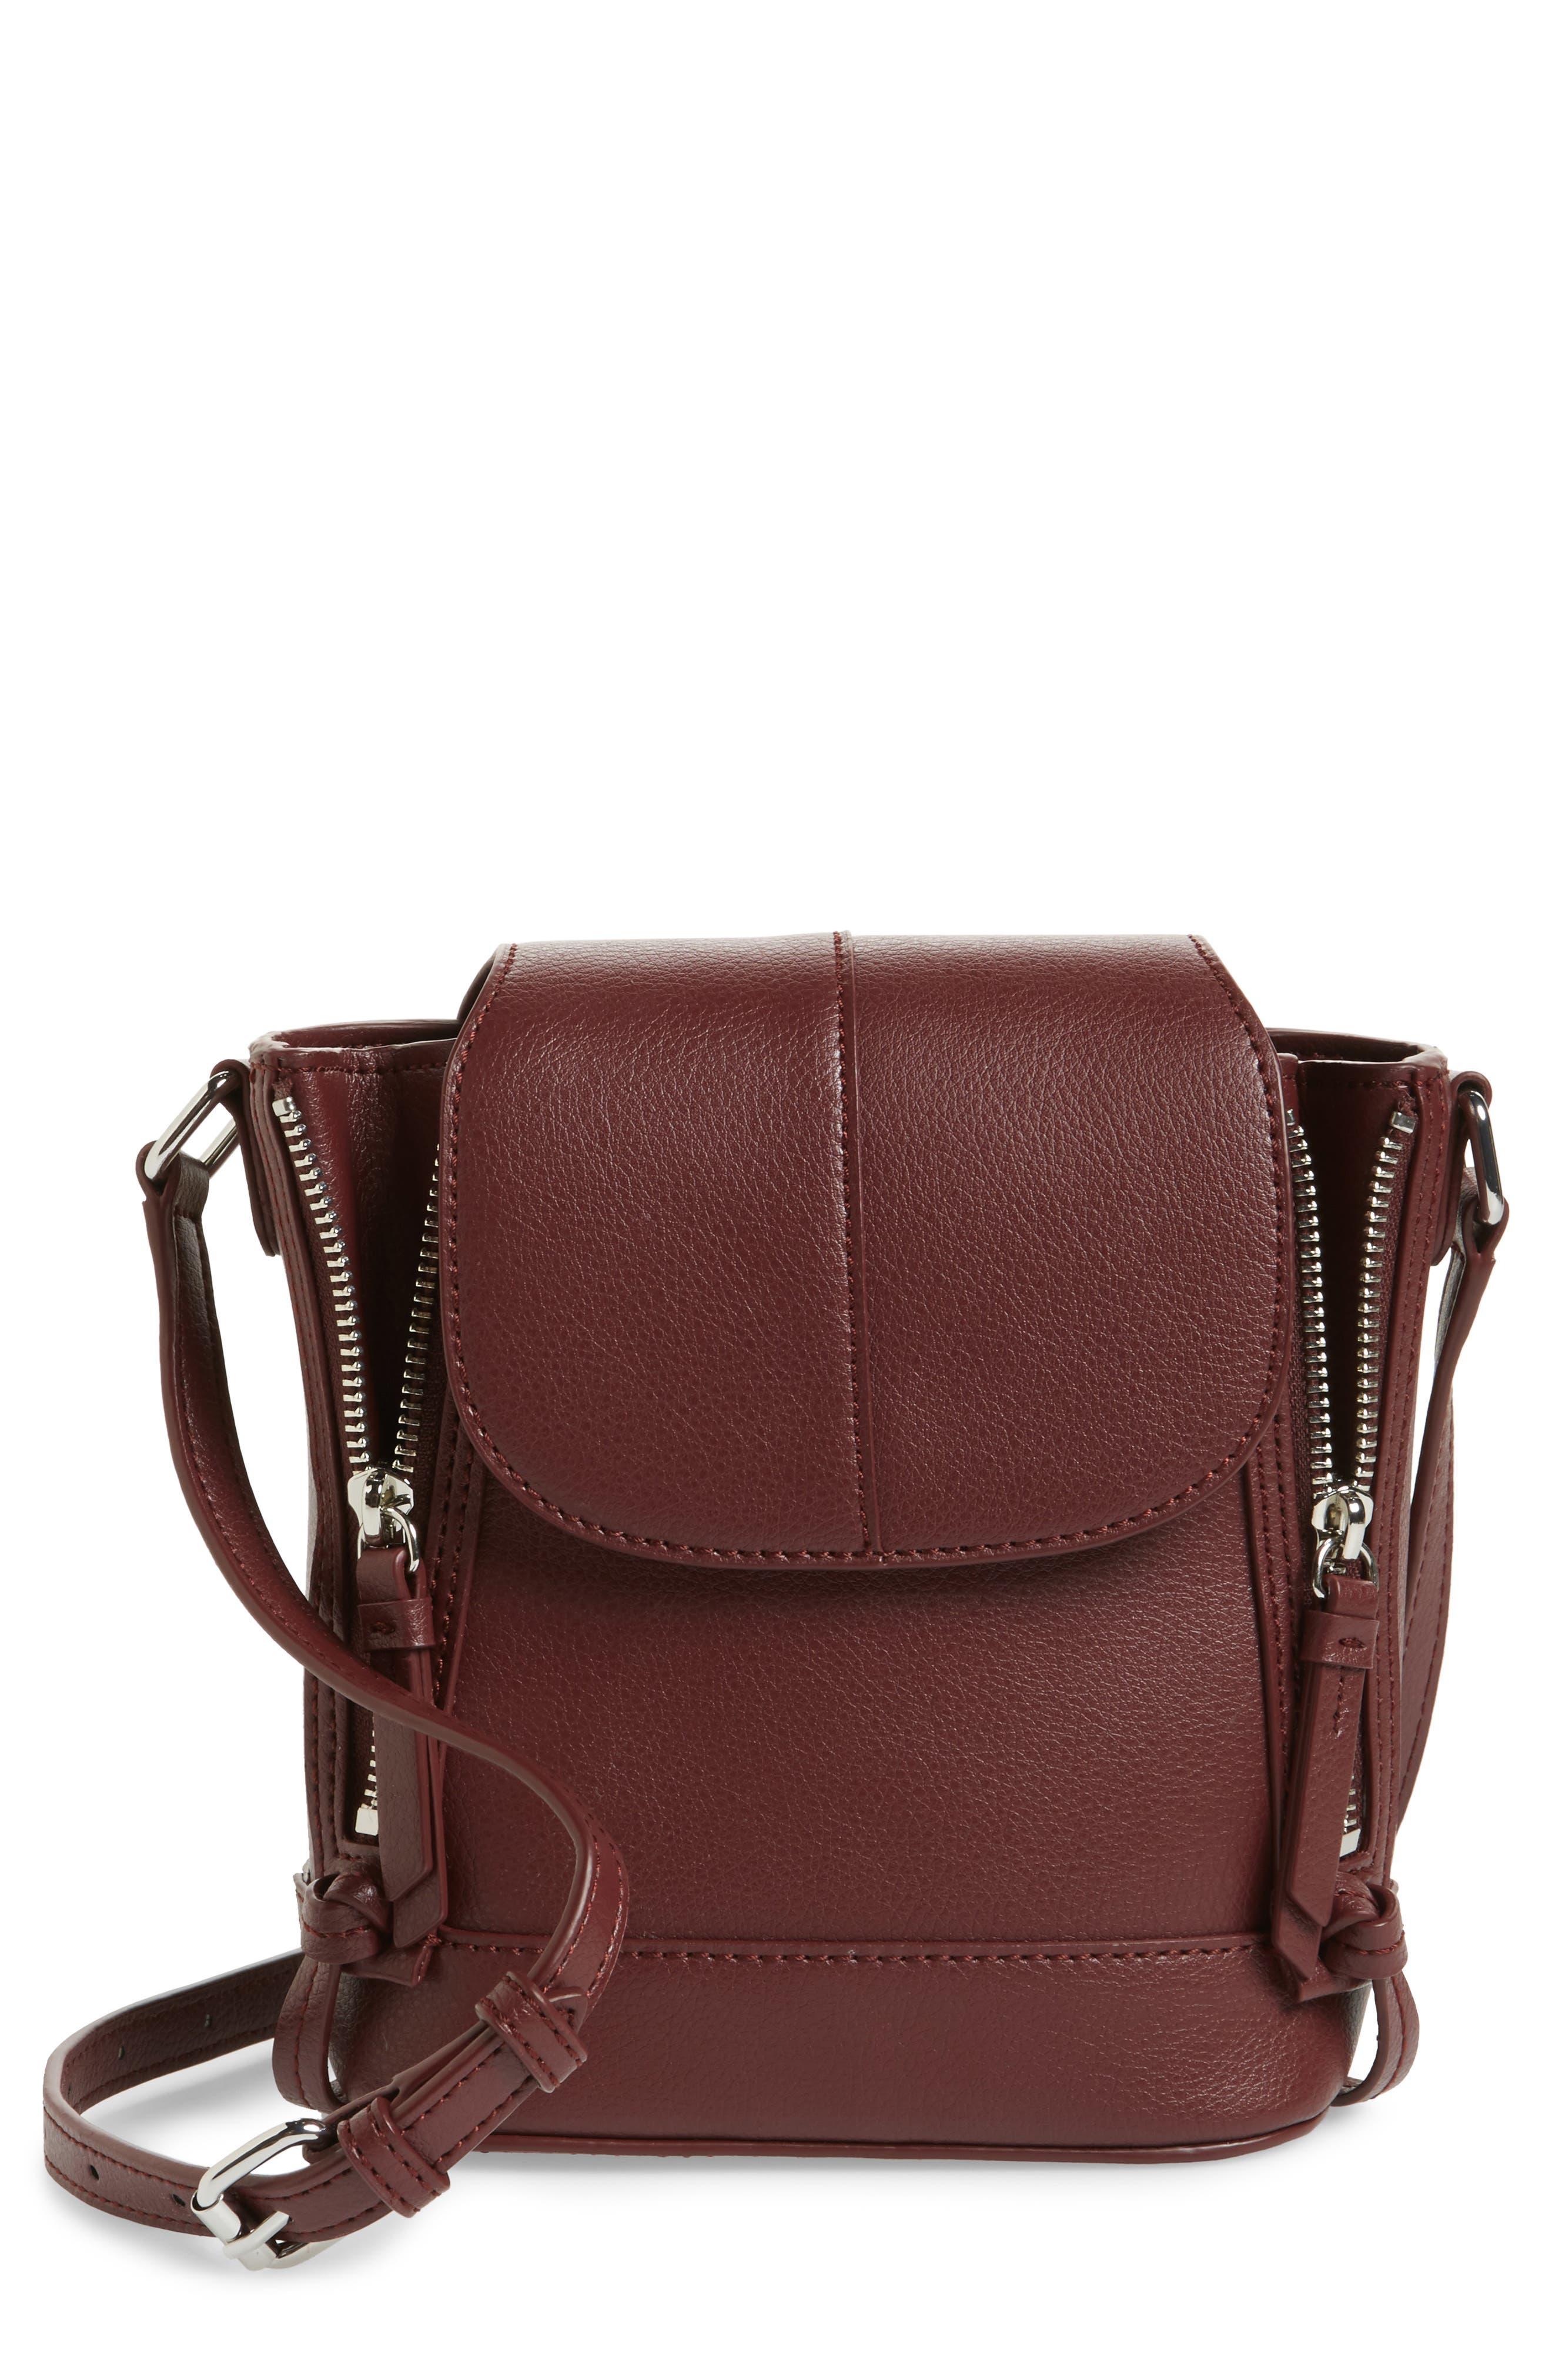 Beckett Leather Crossbody Bag,                             Main thumbnail 1, color,                             Wine